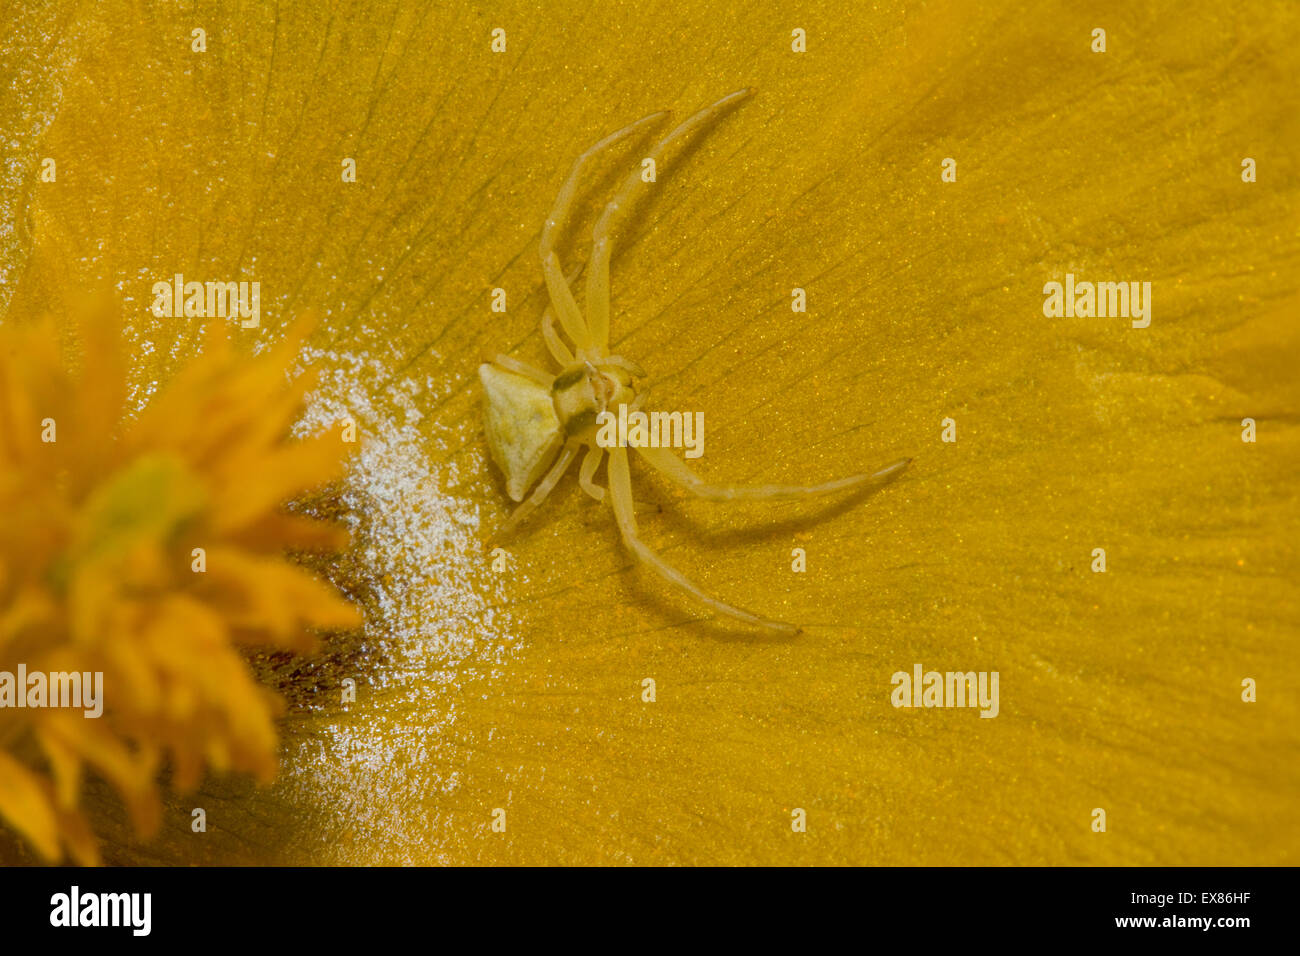 Yellow crab spider (sp) Thomisus onustus, invertebrate lurking in ambush on a yellow hornpoppy. Lemnos/ Limnos island, - Stock Image